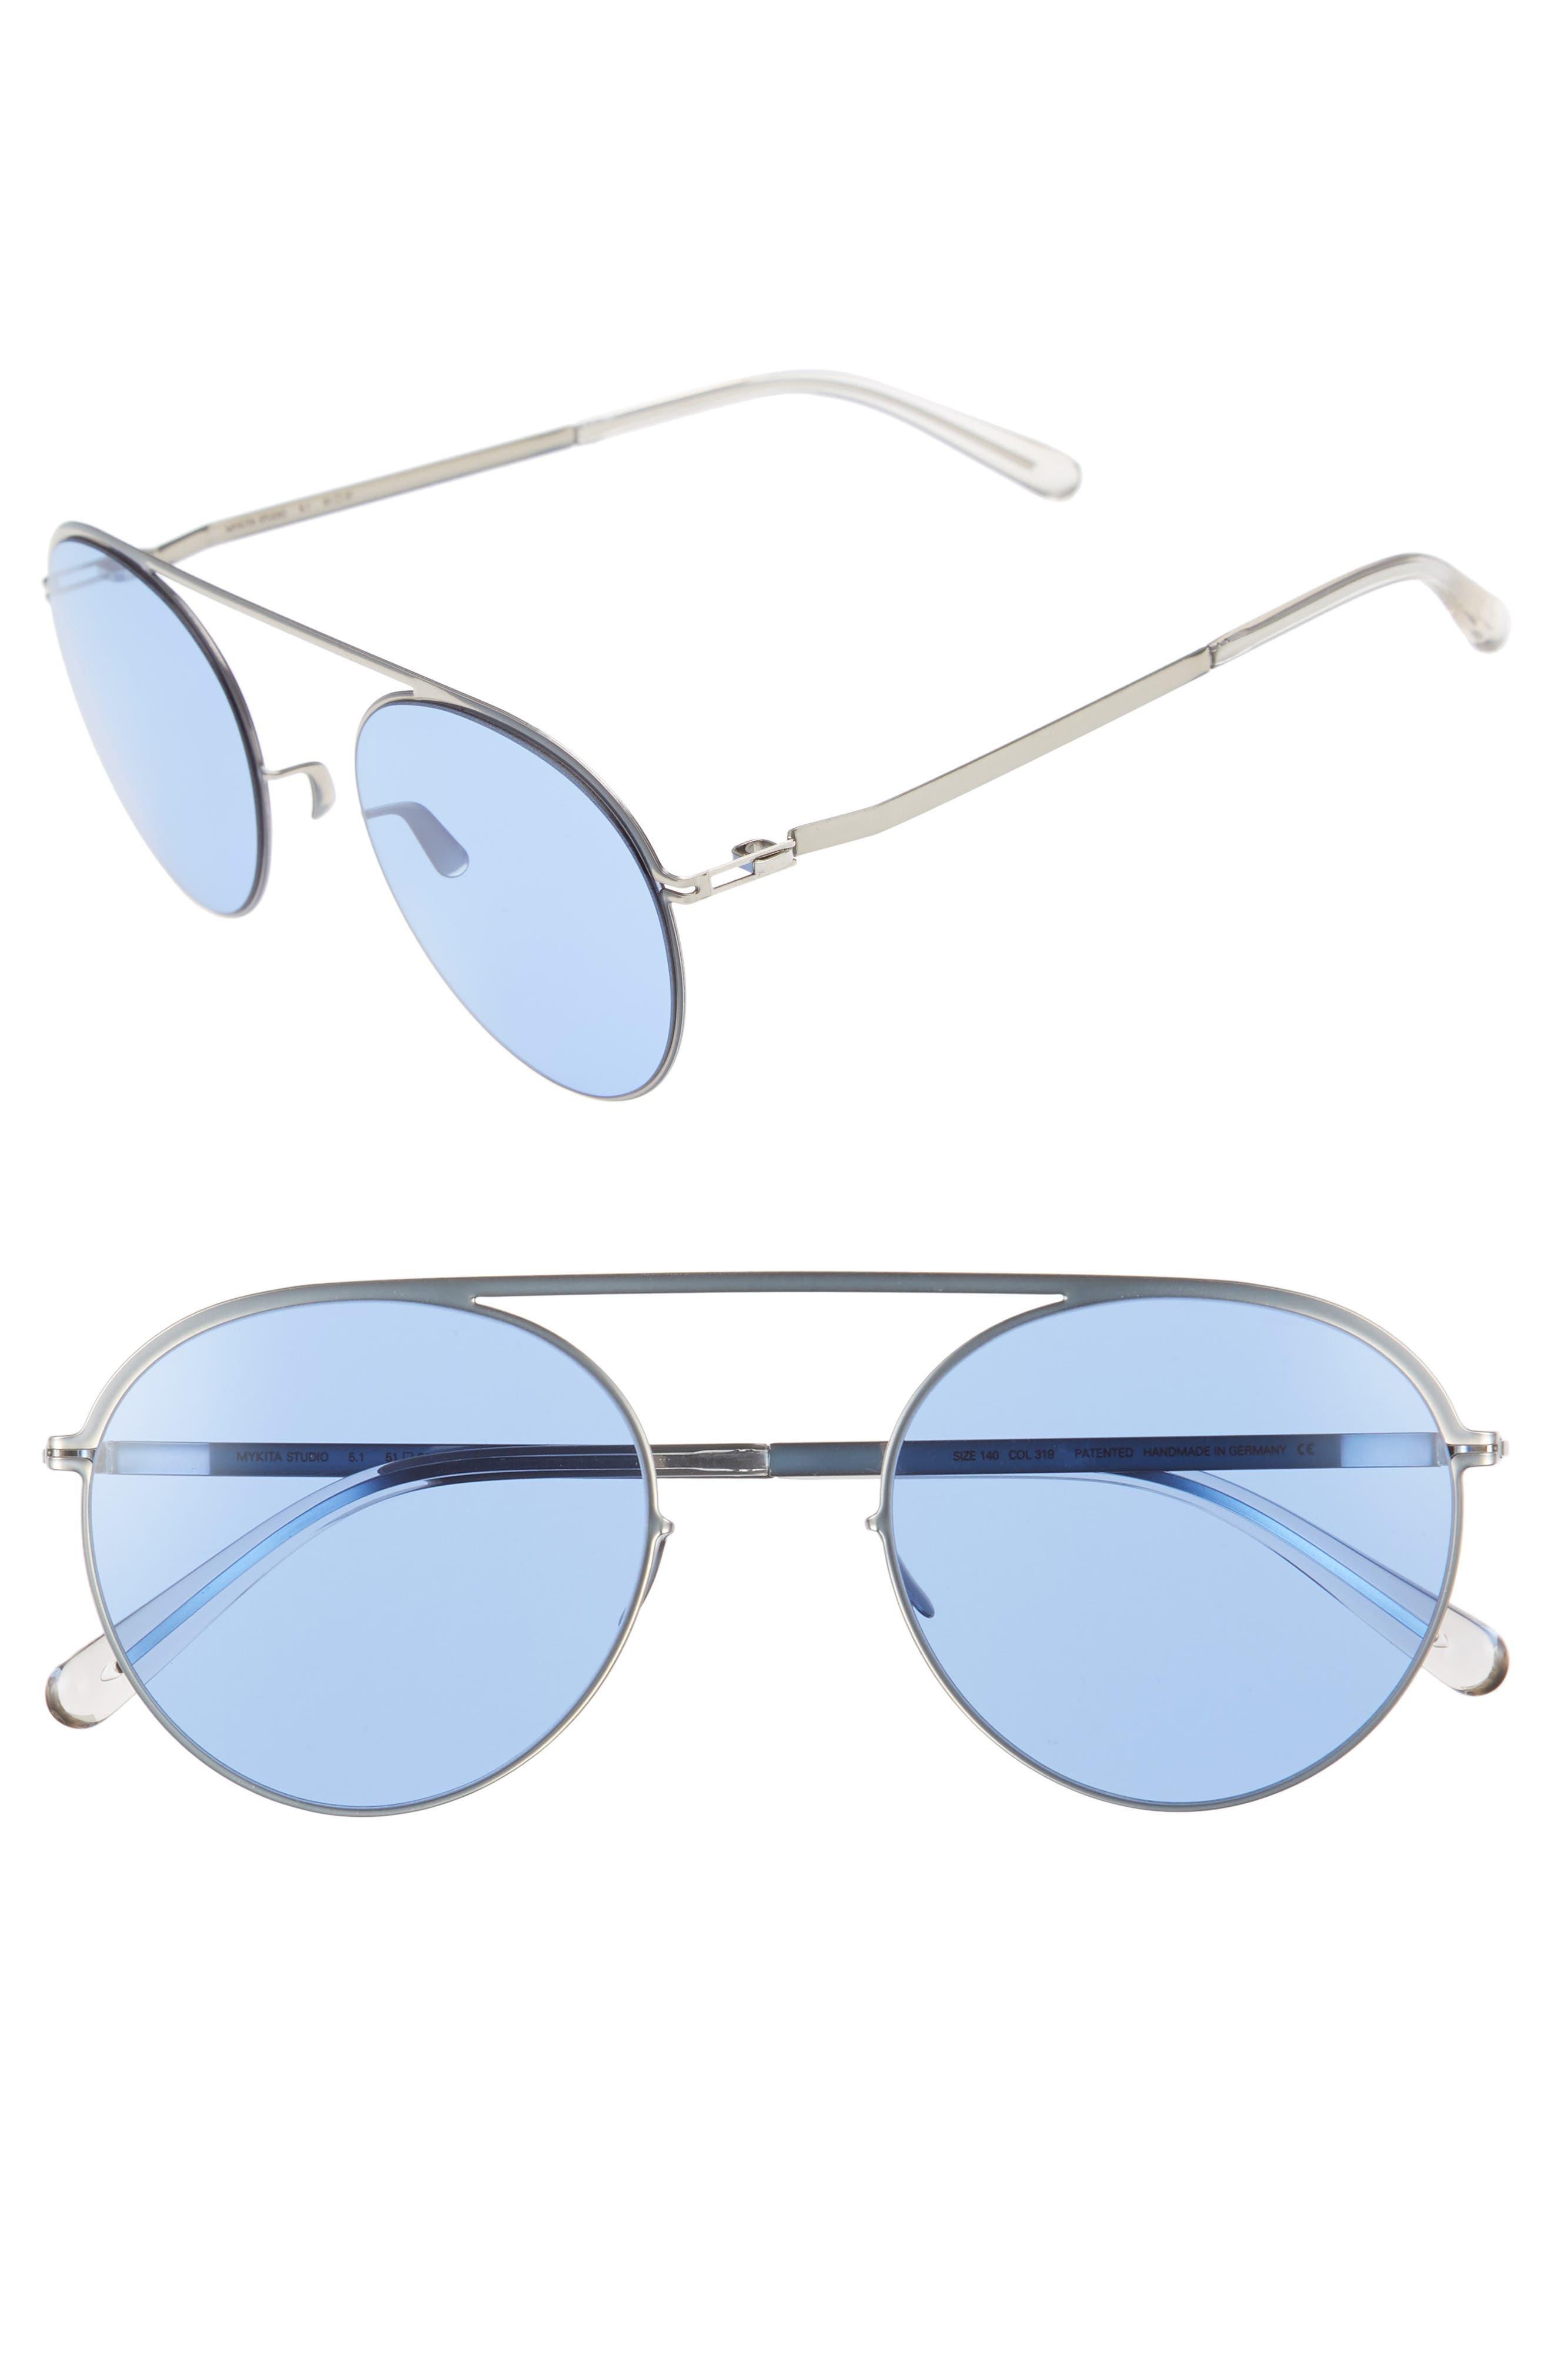 Studio 5.1 51mm Sunglasses,                             Main thumbnail 1, color,                             Silver